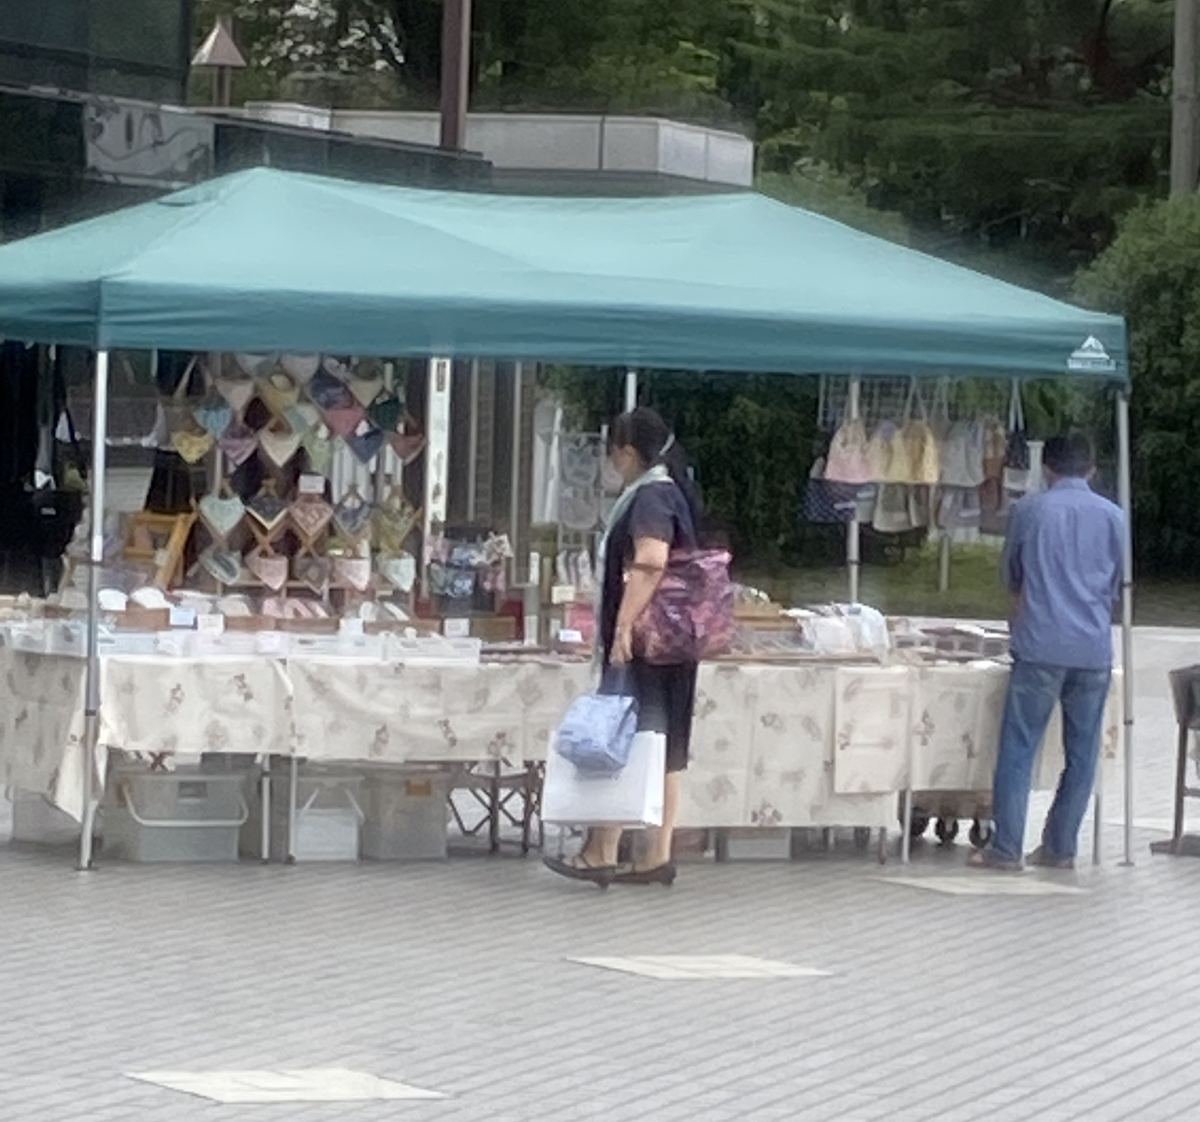 f:id:suzukimethod-kokubunjishibu:20210629134301j:plain